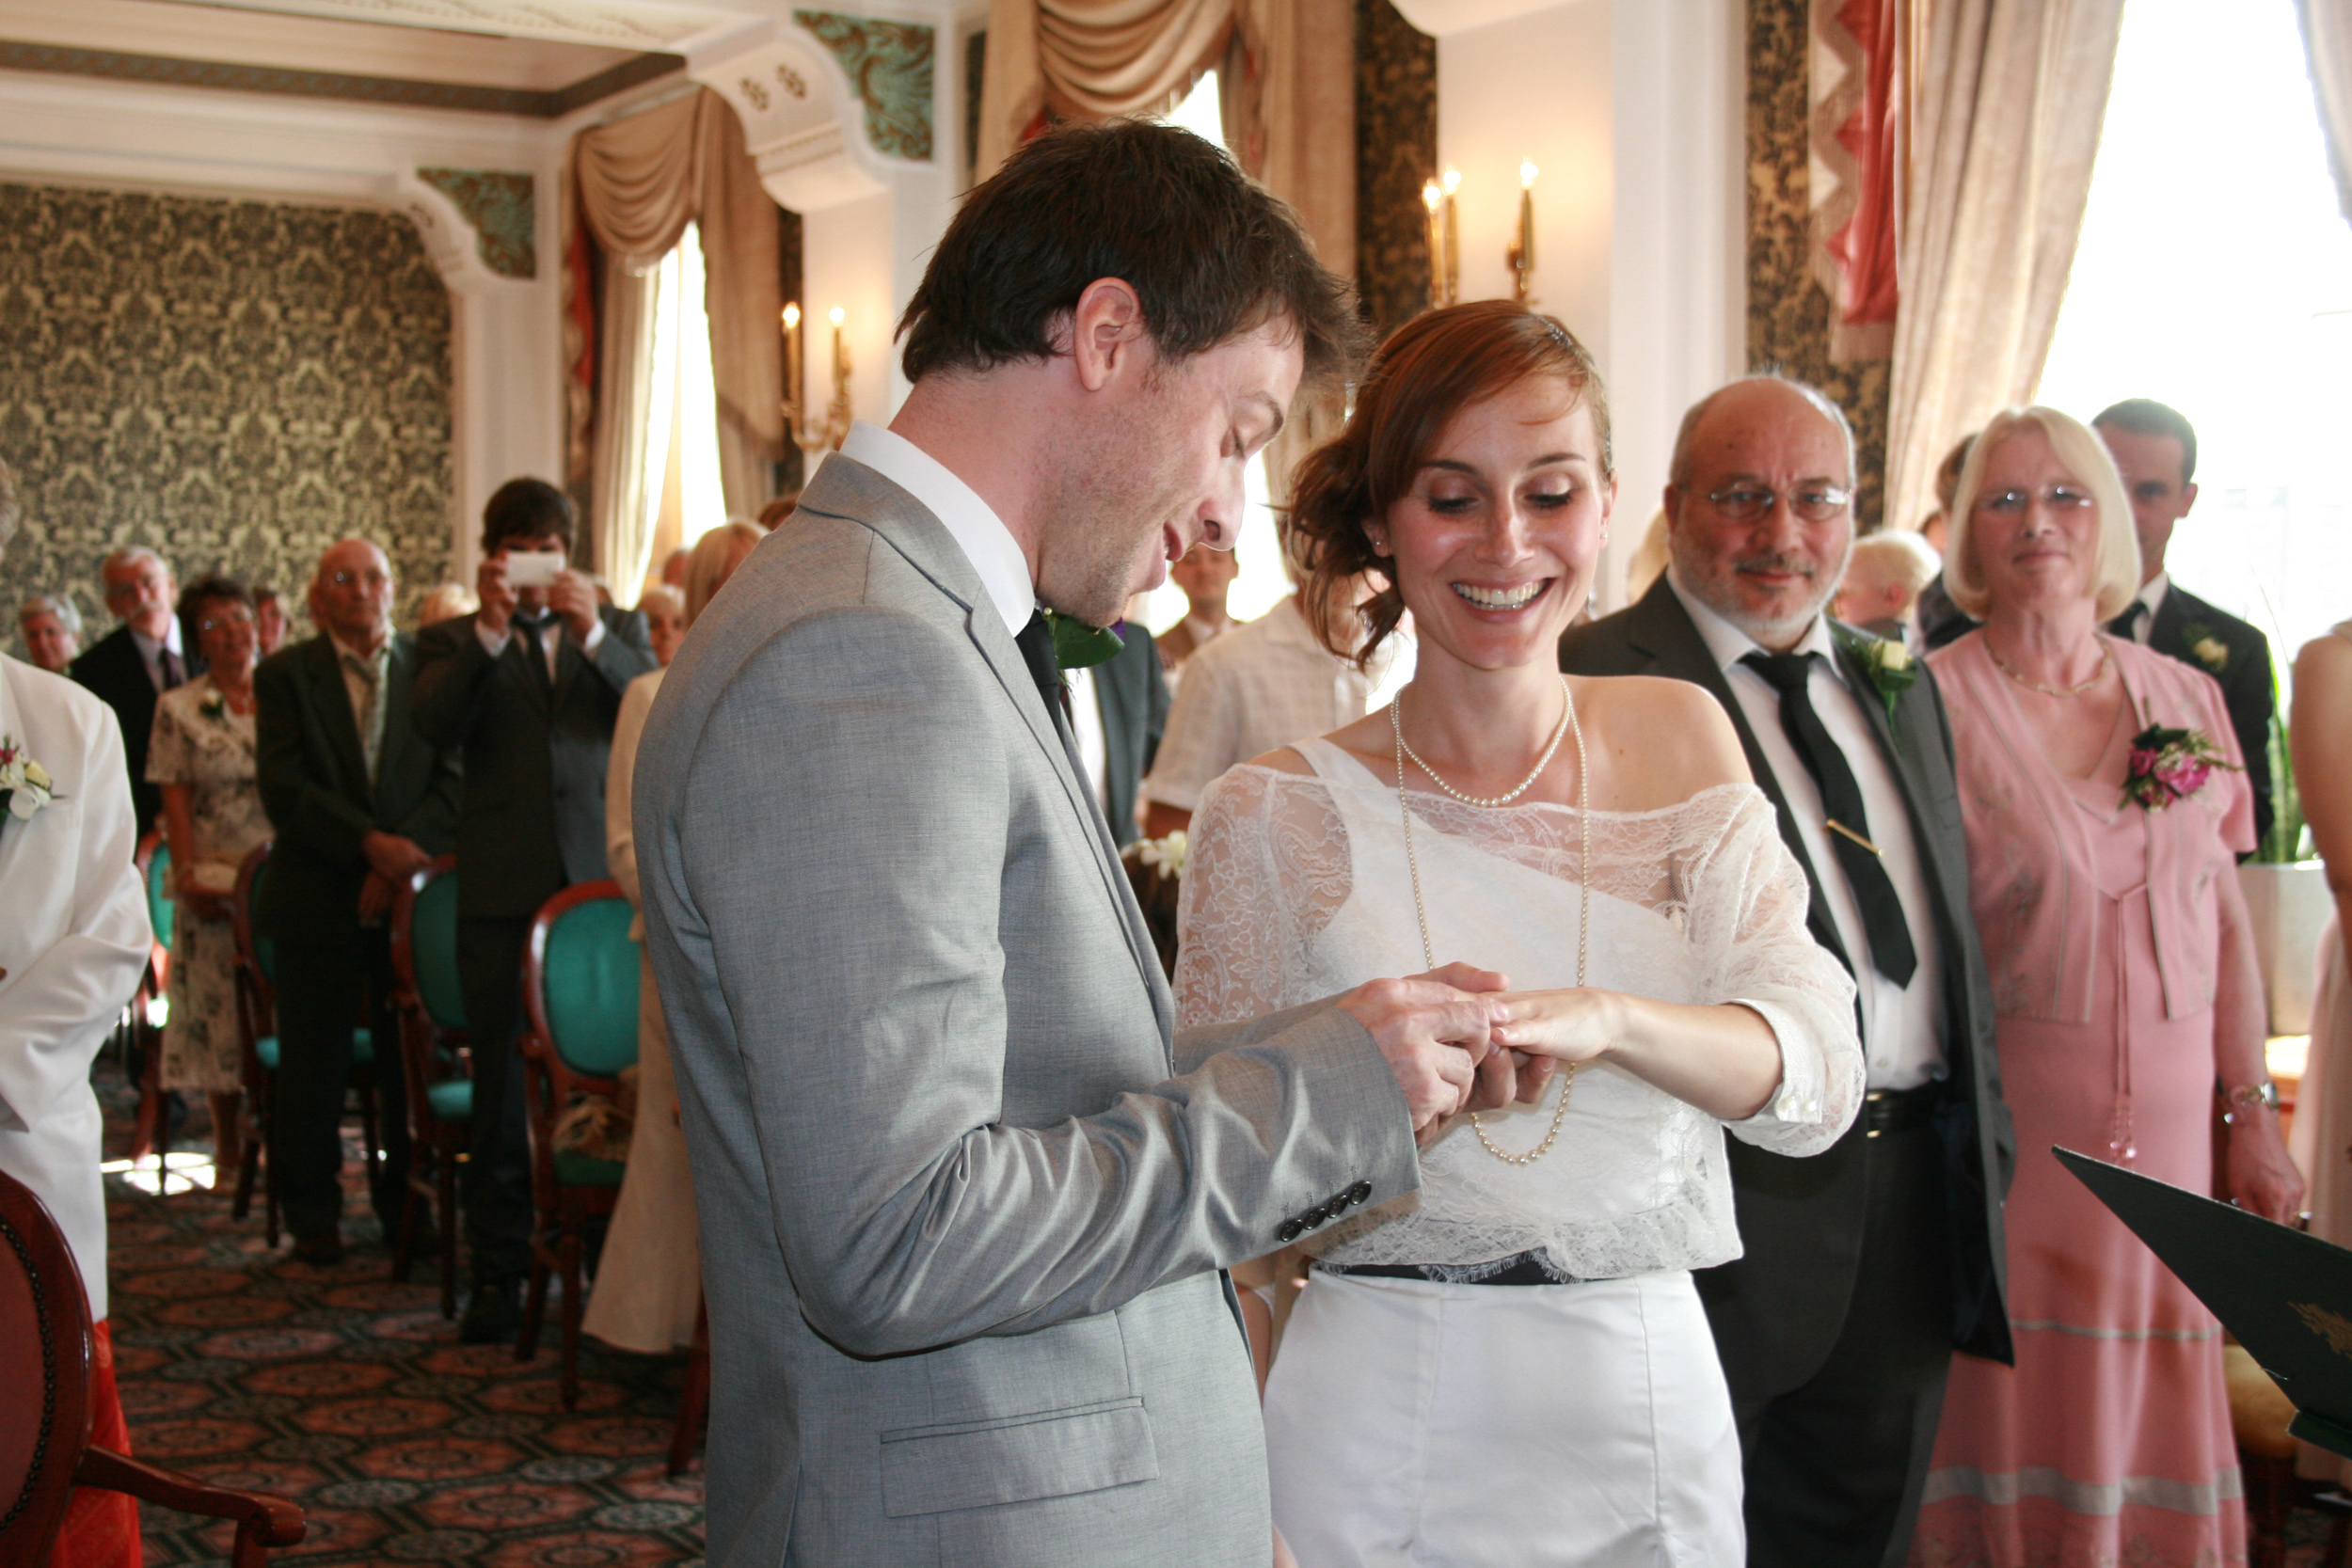 Alexandra-bespoke-wedding-dress-Kate-Beaumont-4.jpg